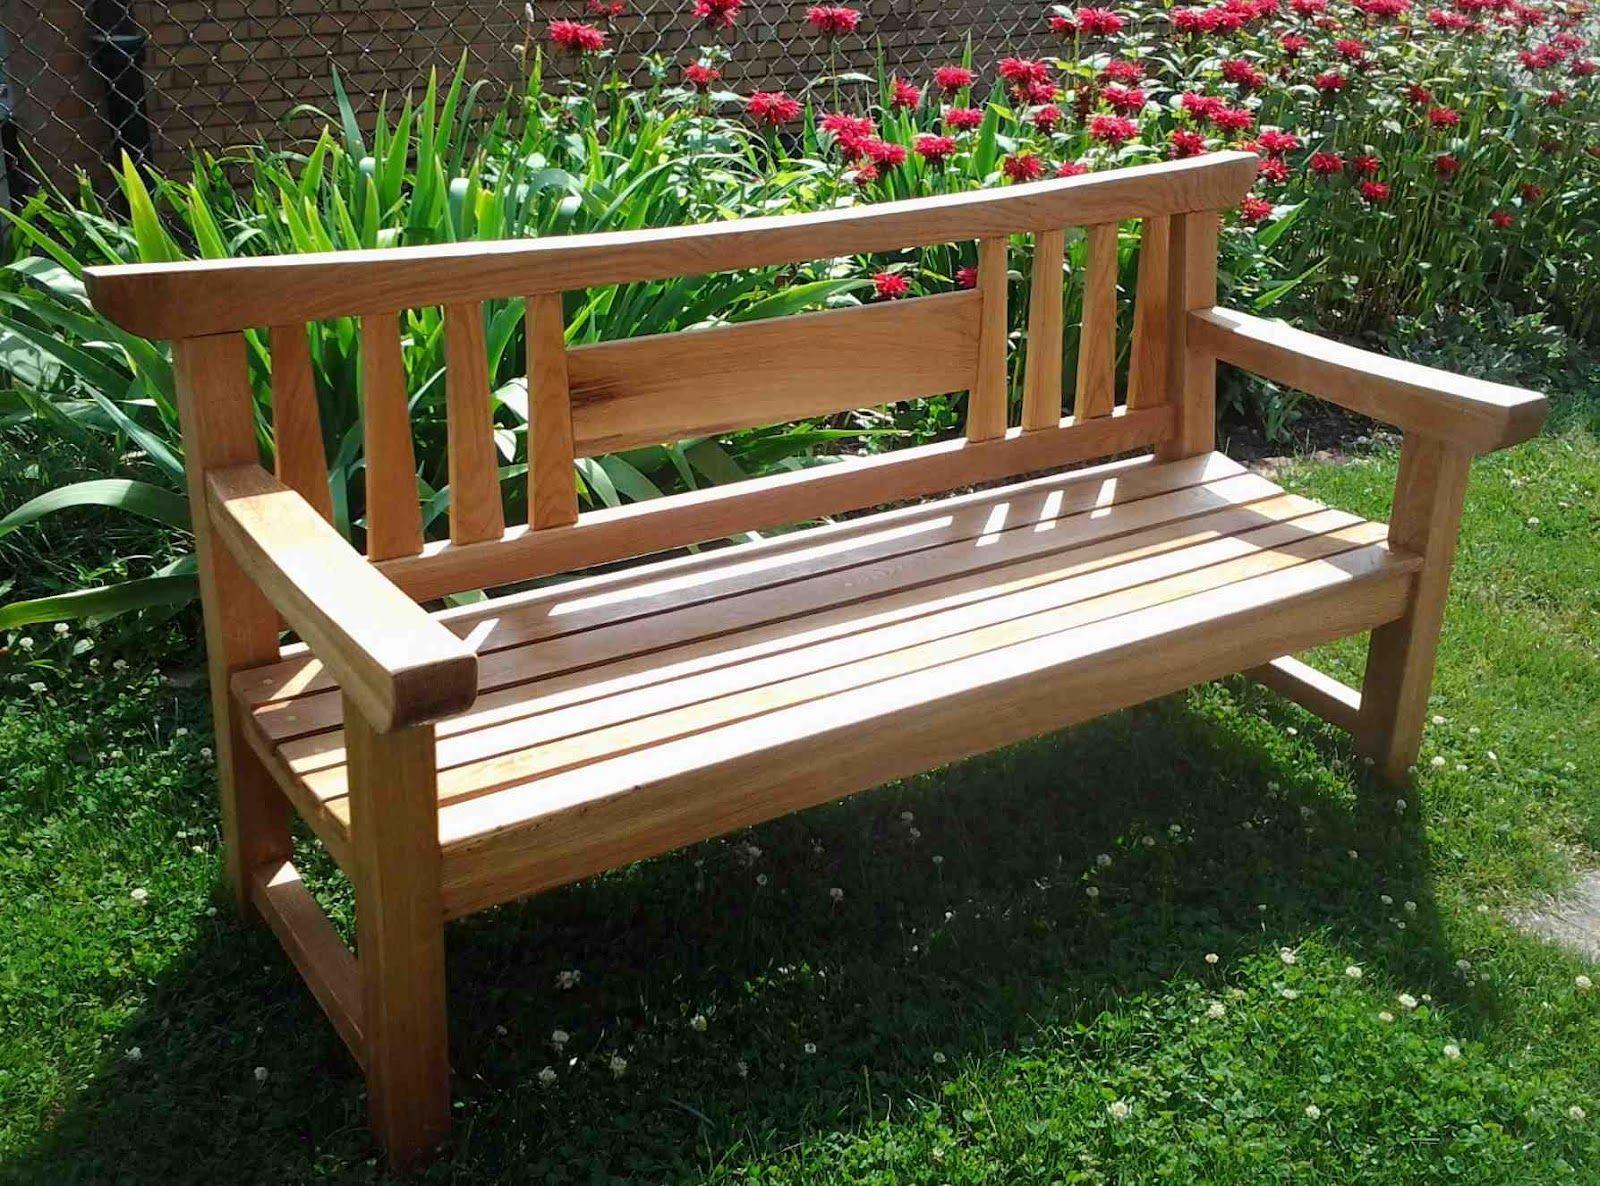 10 Garden Bench Ideas, Most Stylish And Attractive | Garden Inside Coleen Outdoor Teak Garden Benches (Photo 4 of 25)